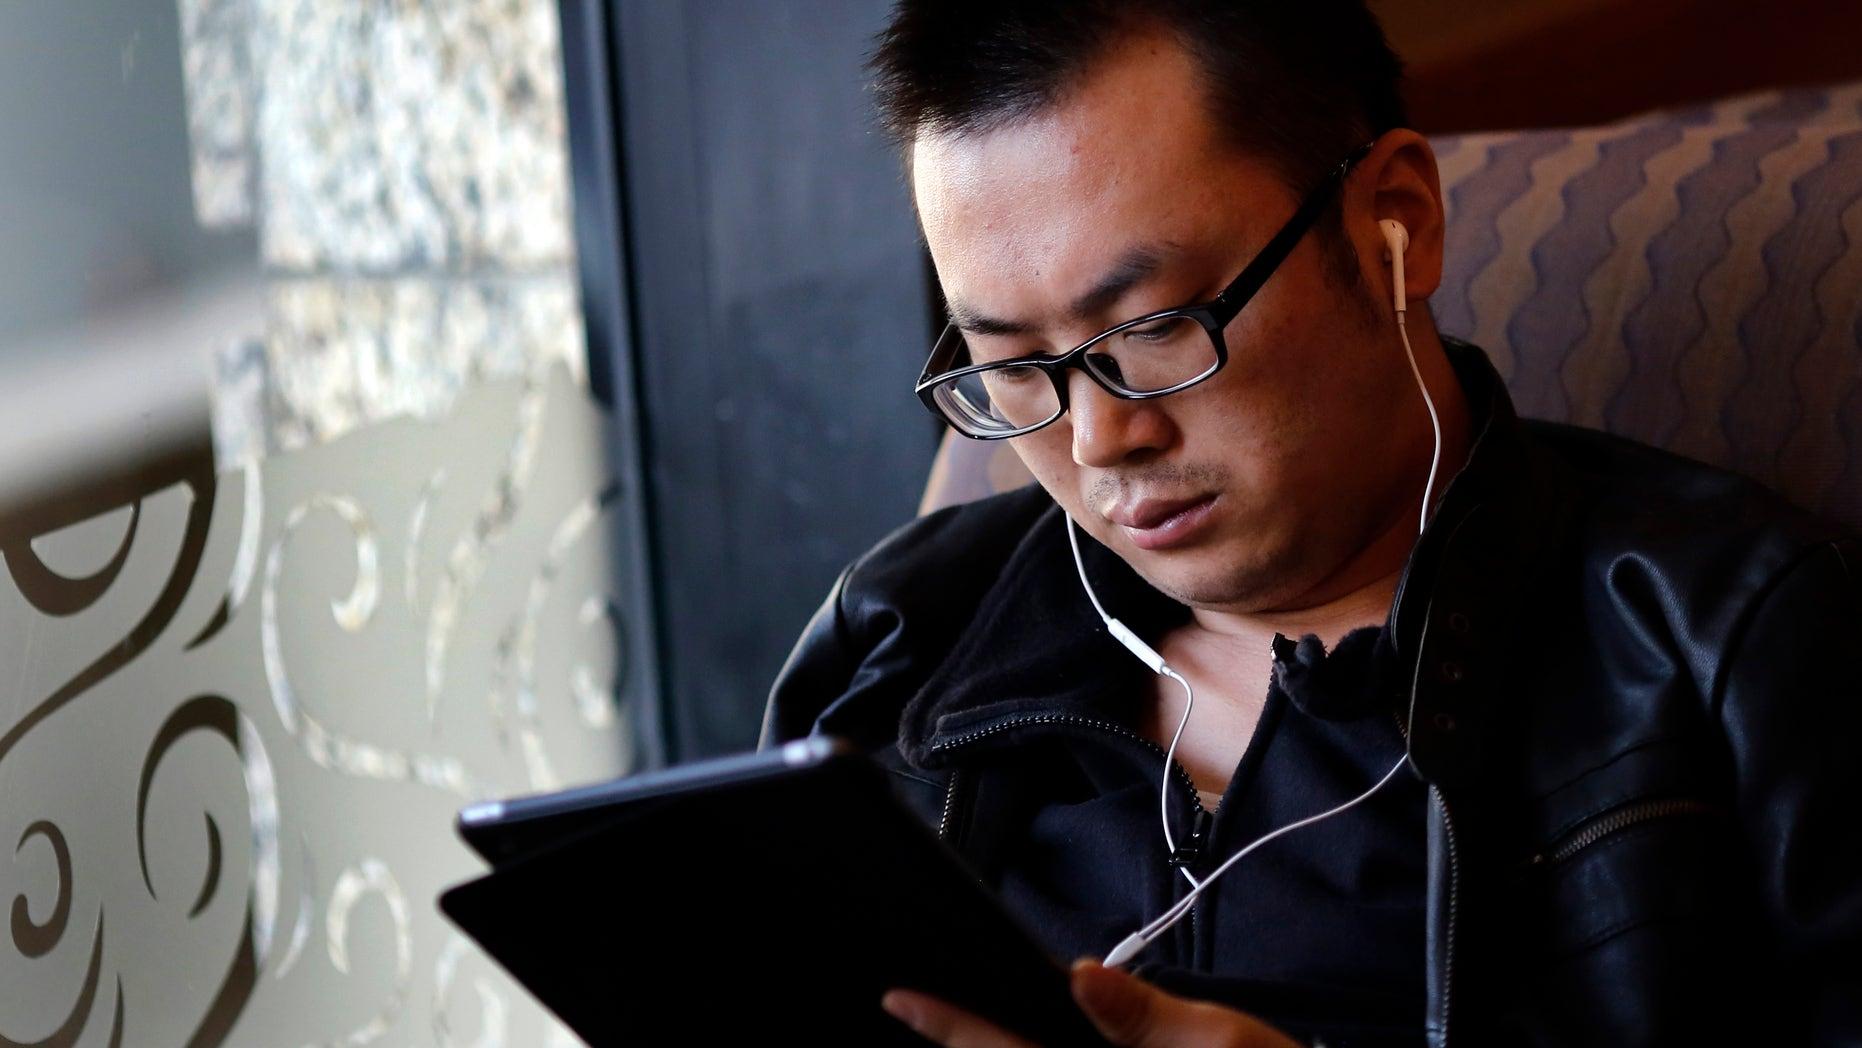 File photo. A man use his iPad inside a local coffee shop in downtown Shanghai November 28, 2013. (REUTERS/Carlos Barria)